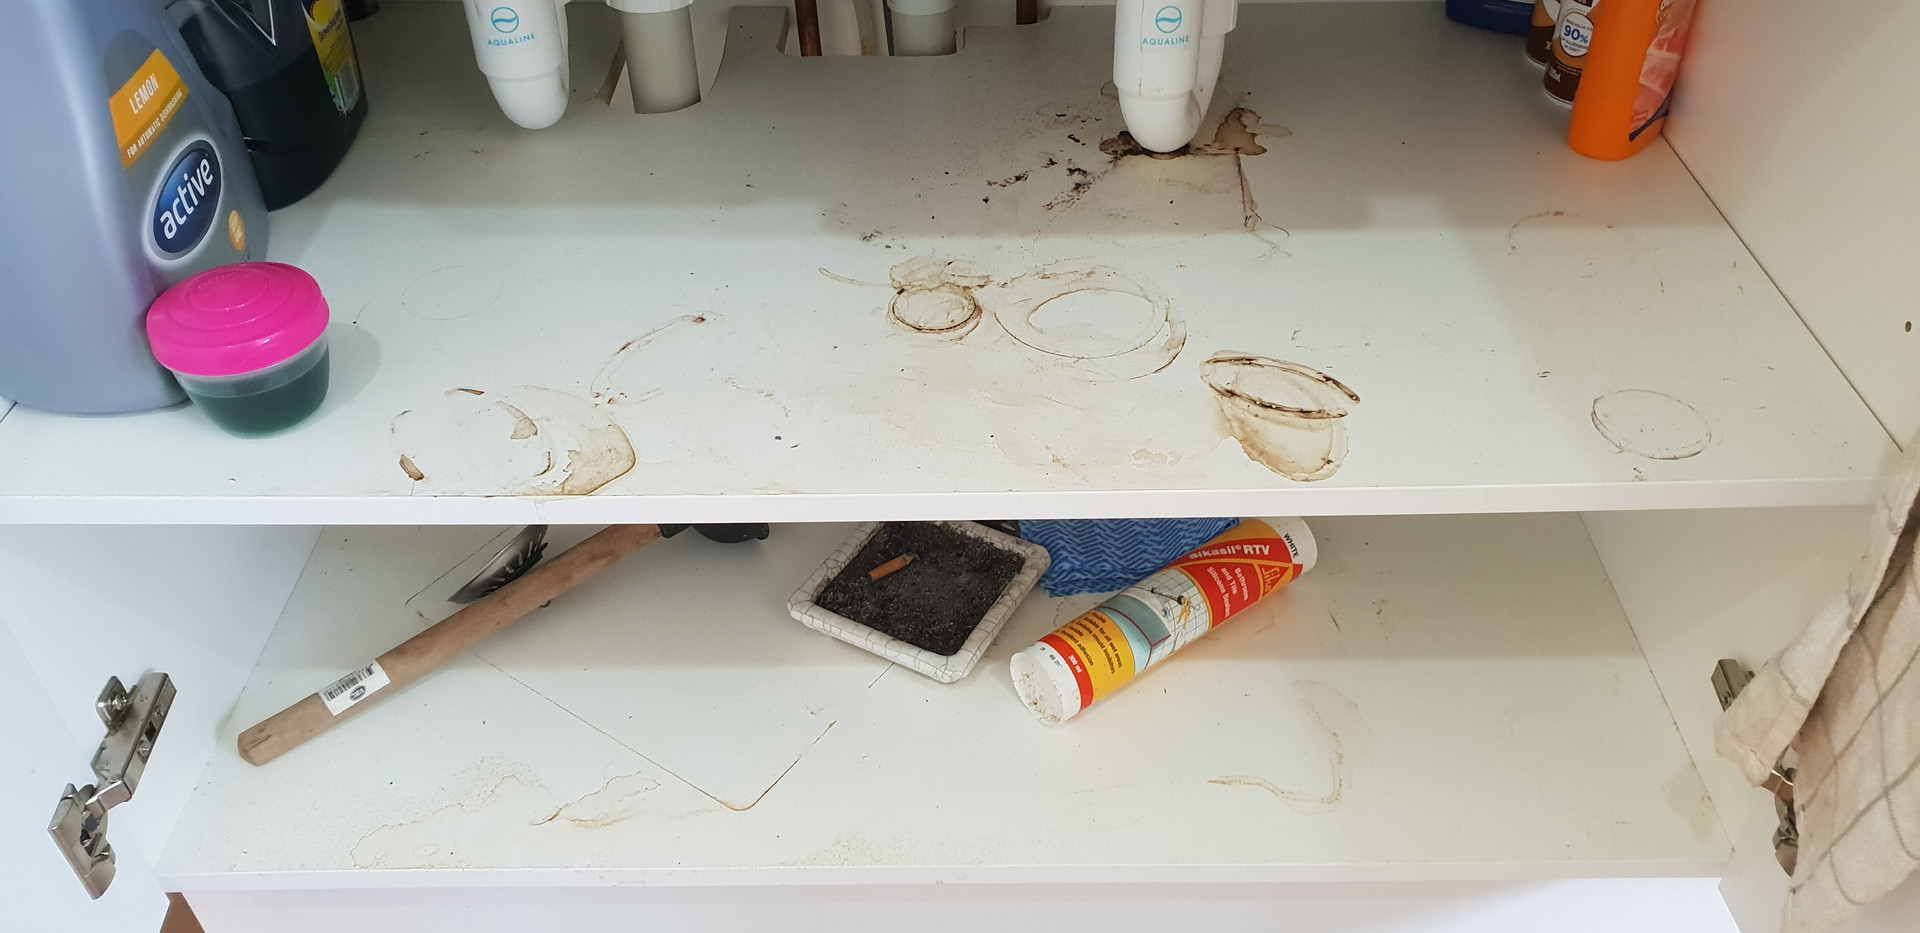 Kitchen cupboard before clean